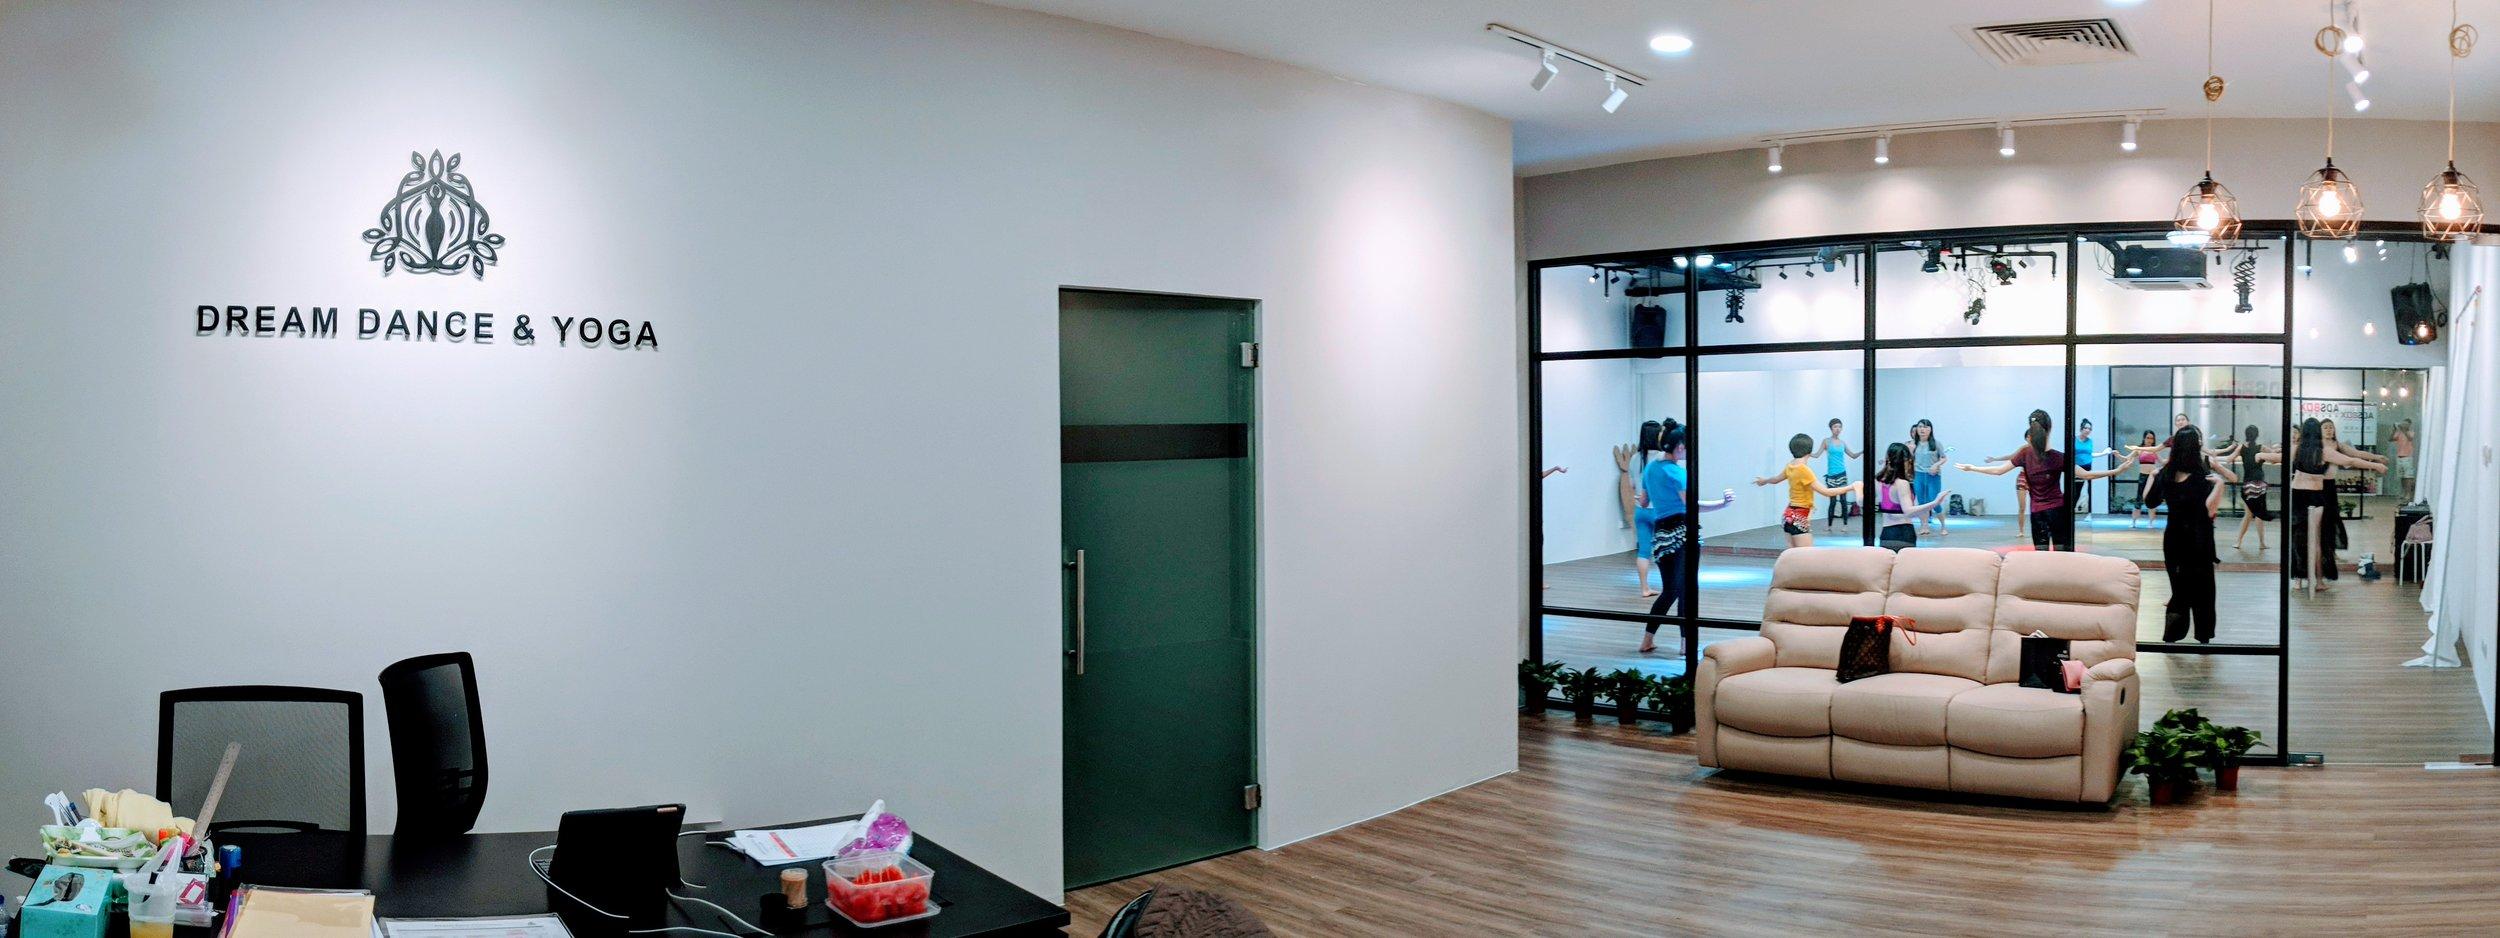 dream-dance-yoga-dance-studio.jpg